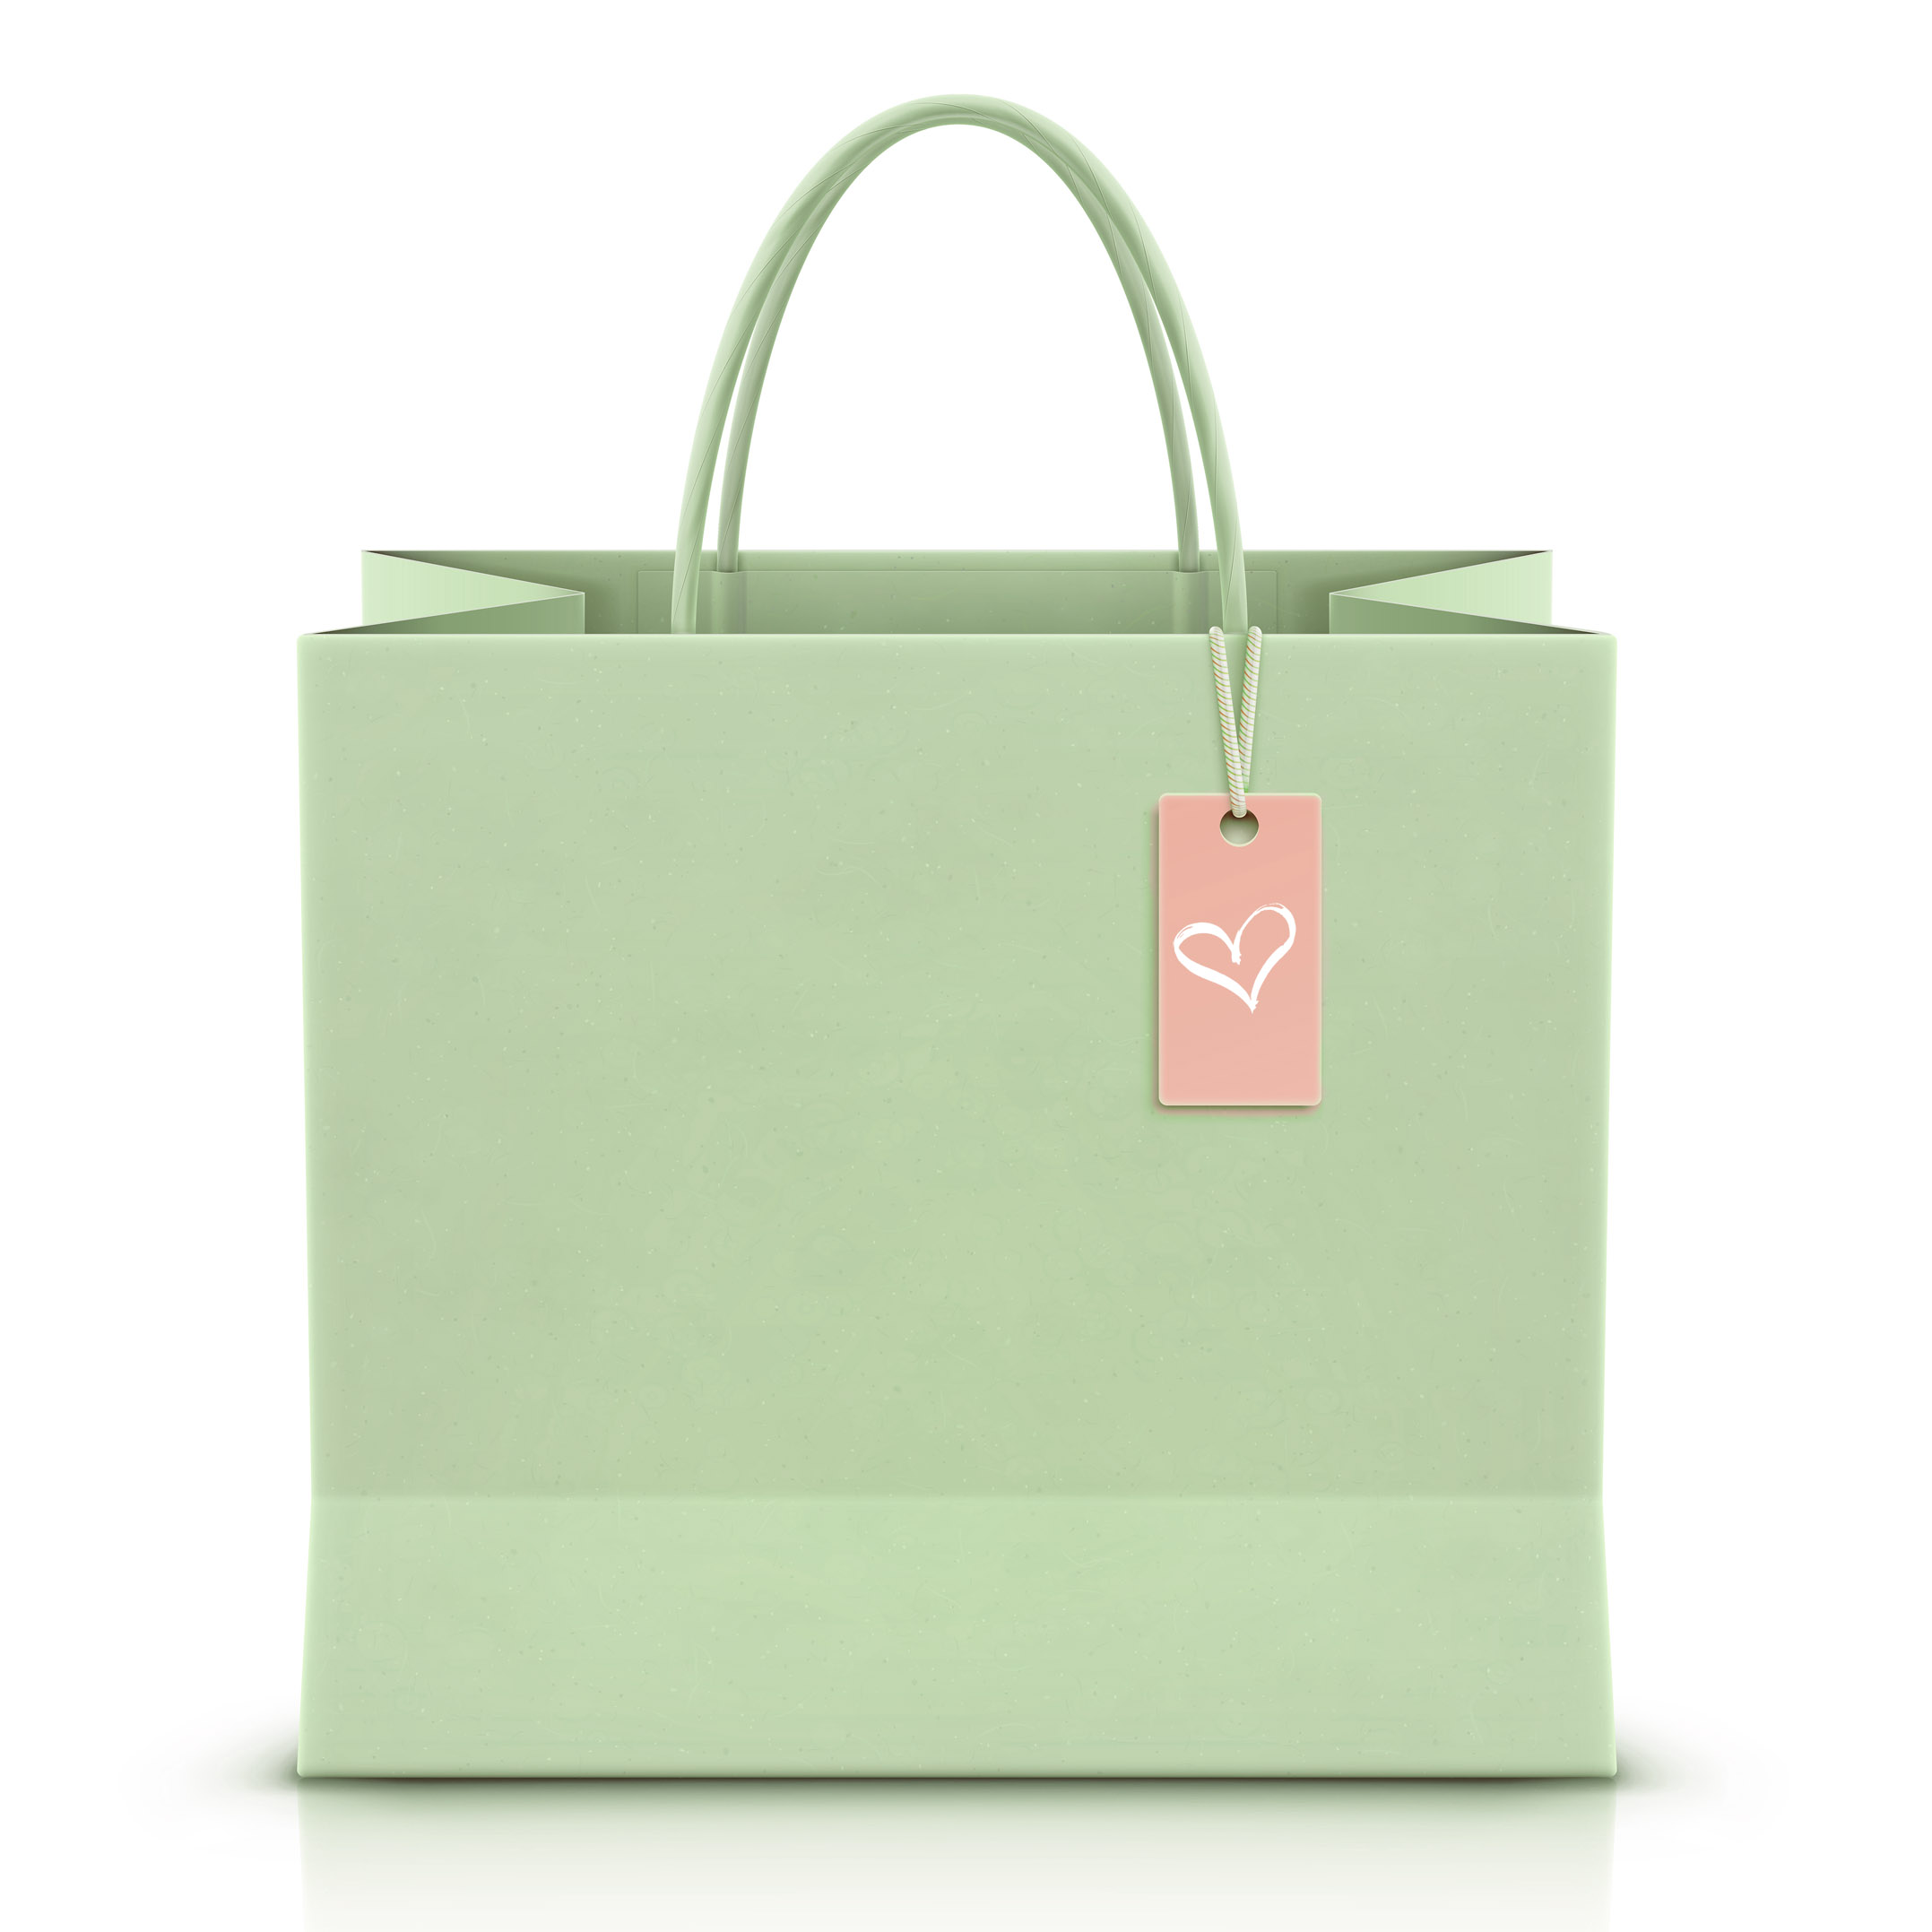 love bags pregnant women help moms 2.jpg